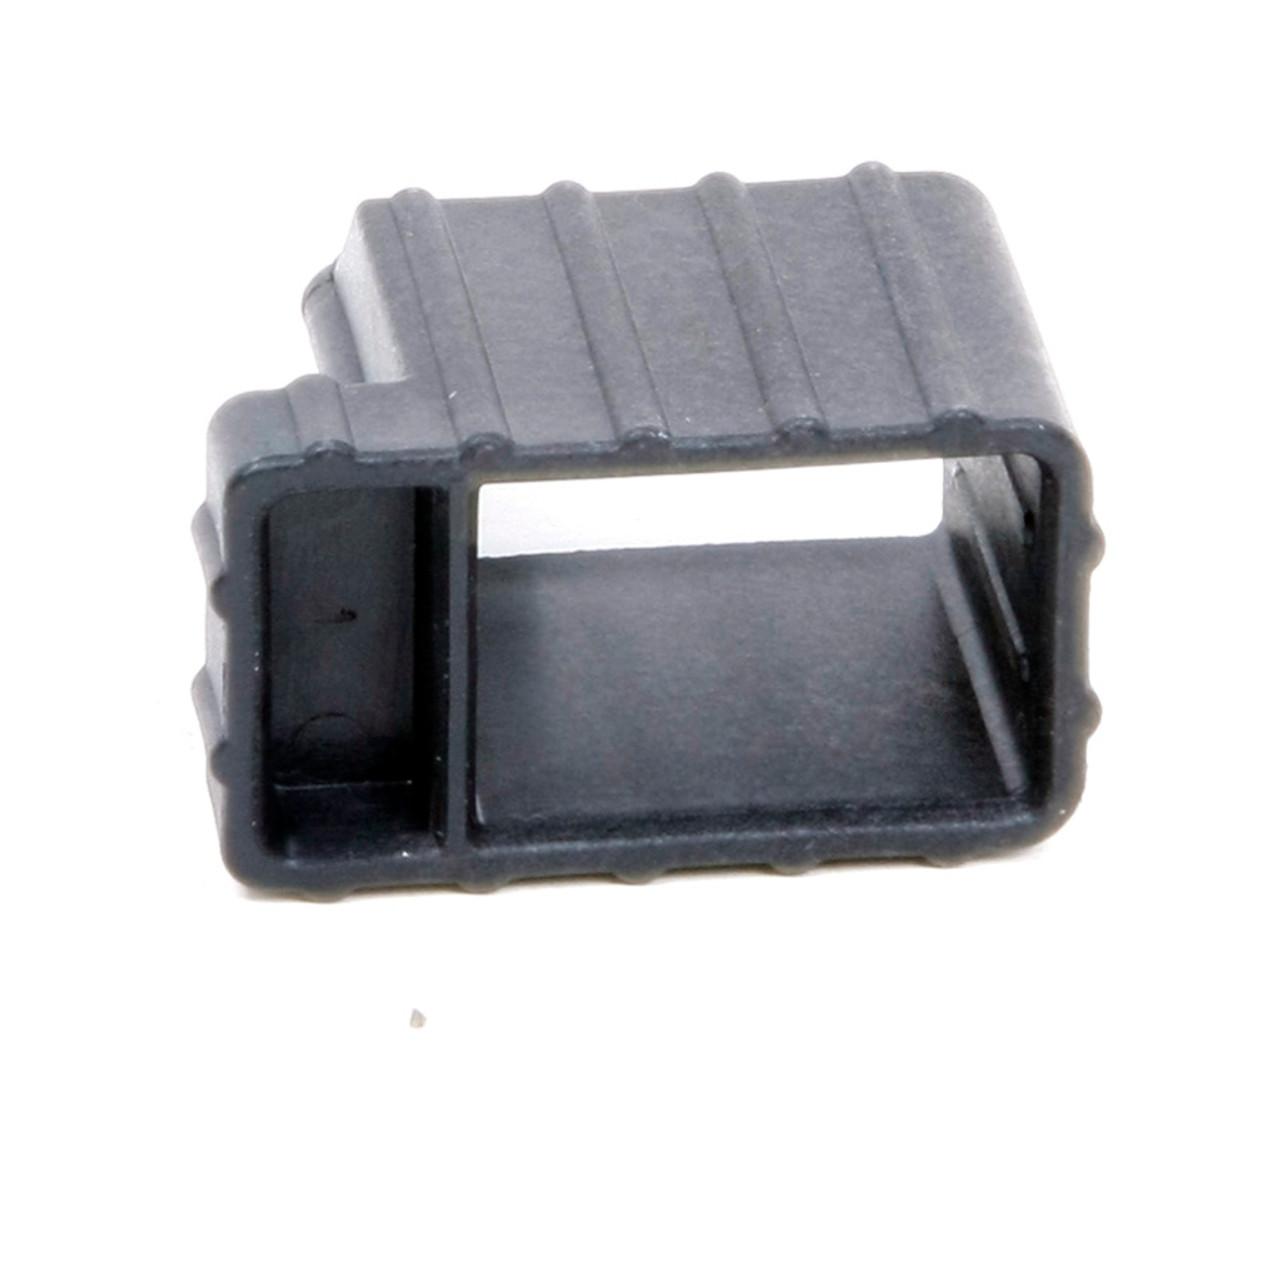 Magazine Loader for the Glock® 9mm &  40 S&W - Black Polymer